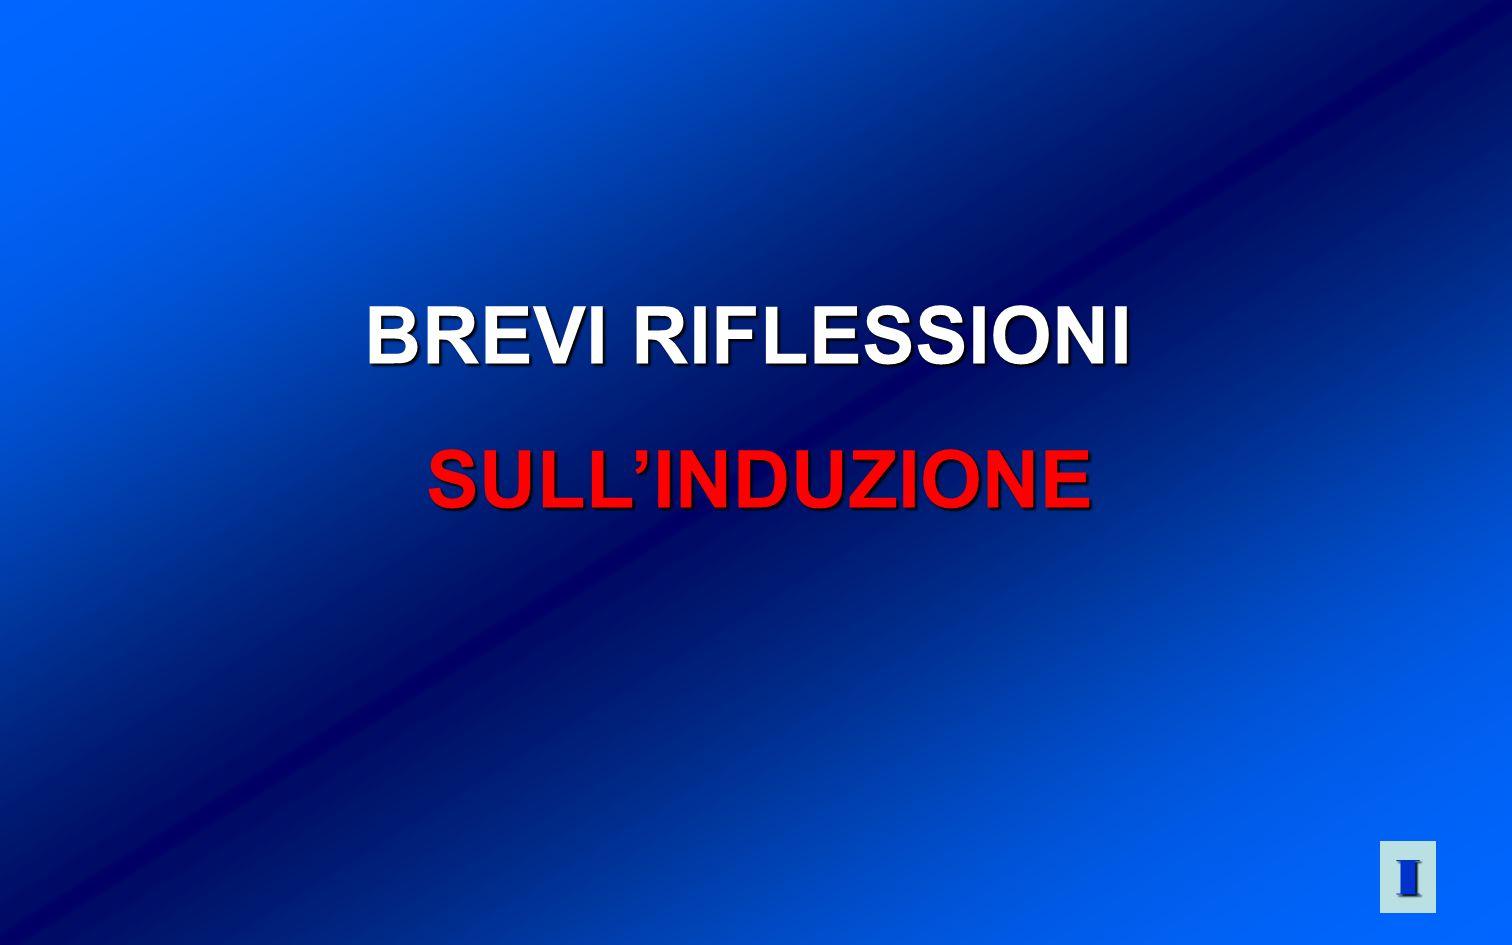 BREVI RIFLESSIONI SULLINDUZIONE SULLINDUZIONE IIII